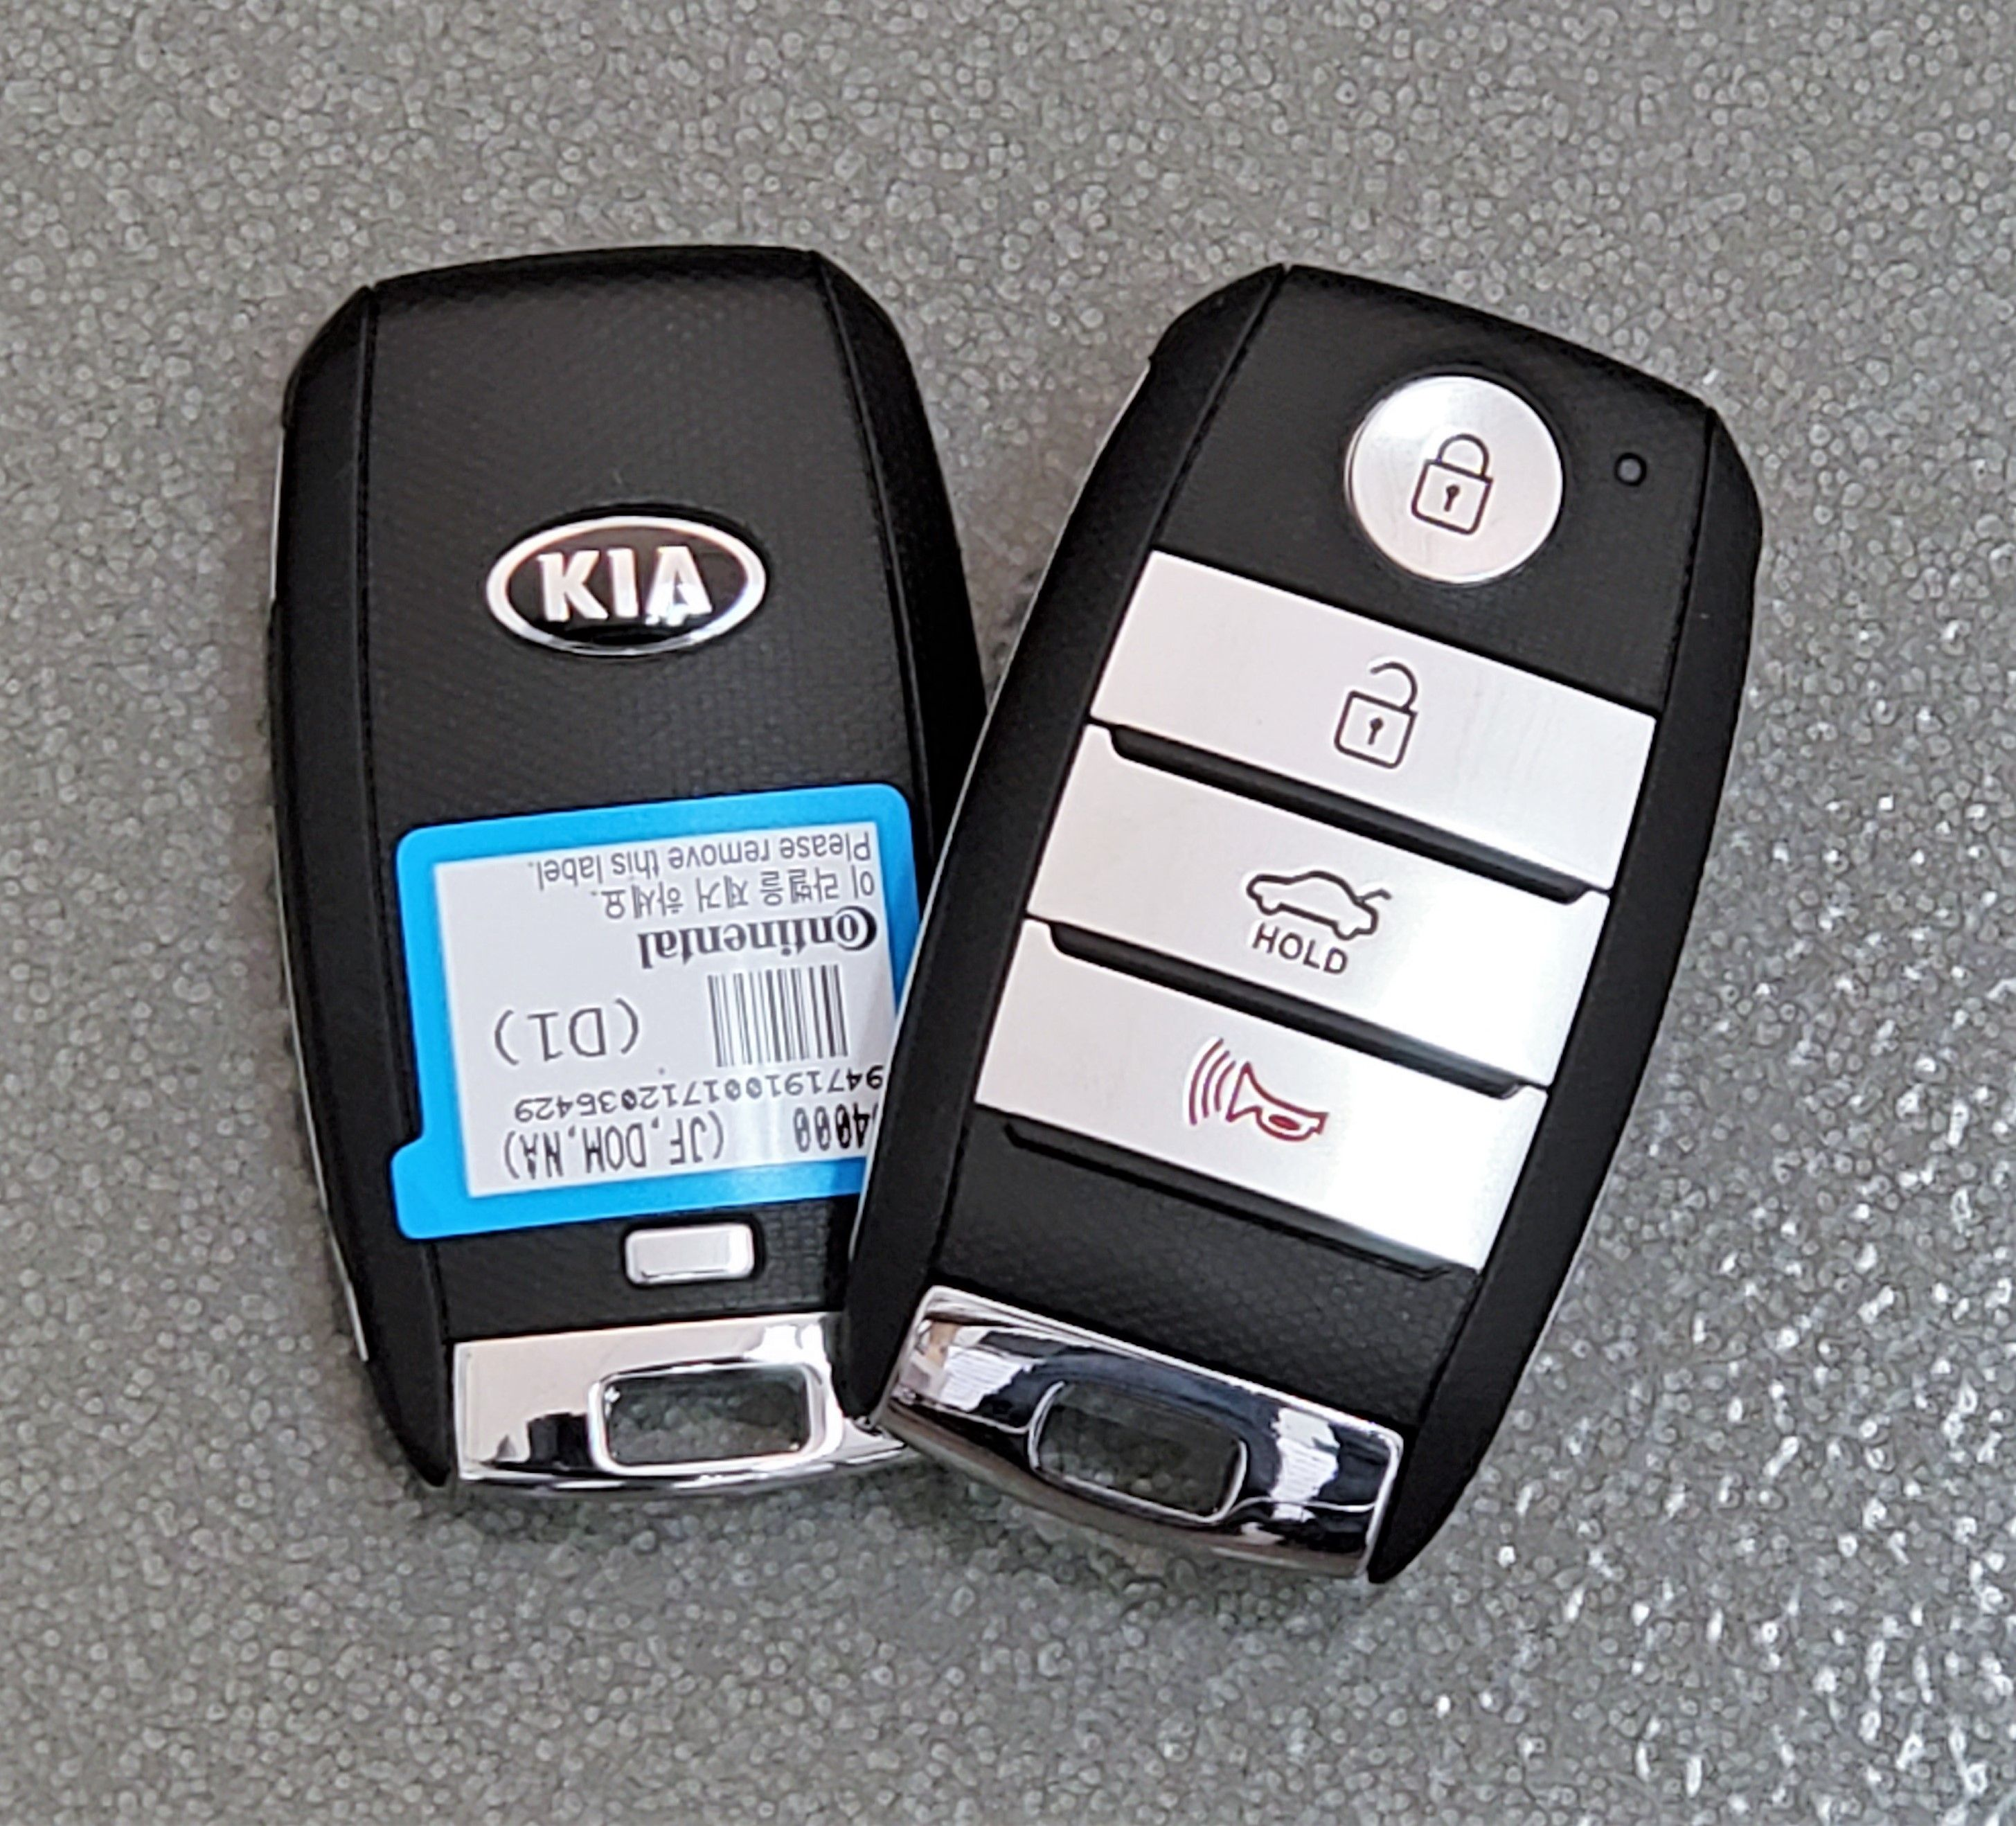 Kia Keyless Entry Remotes Commercial Locksmith Car Key Replacement Locksmith